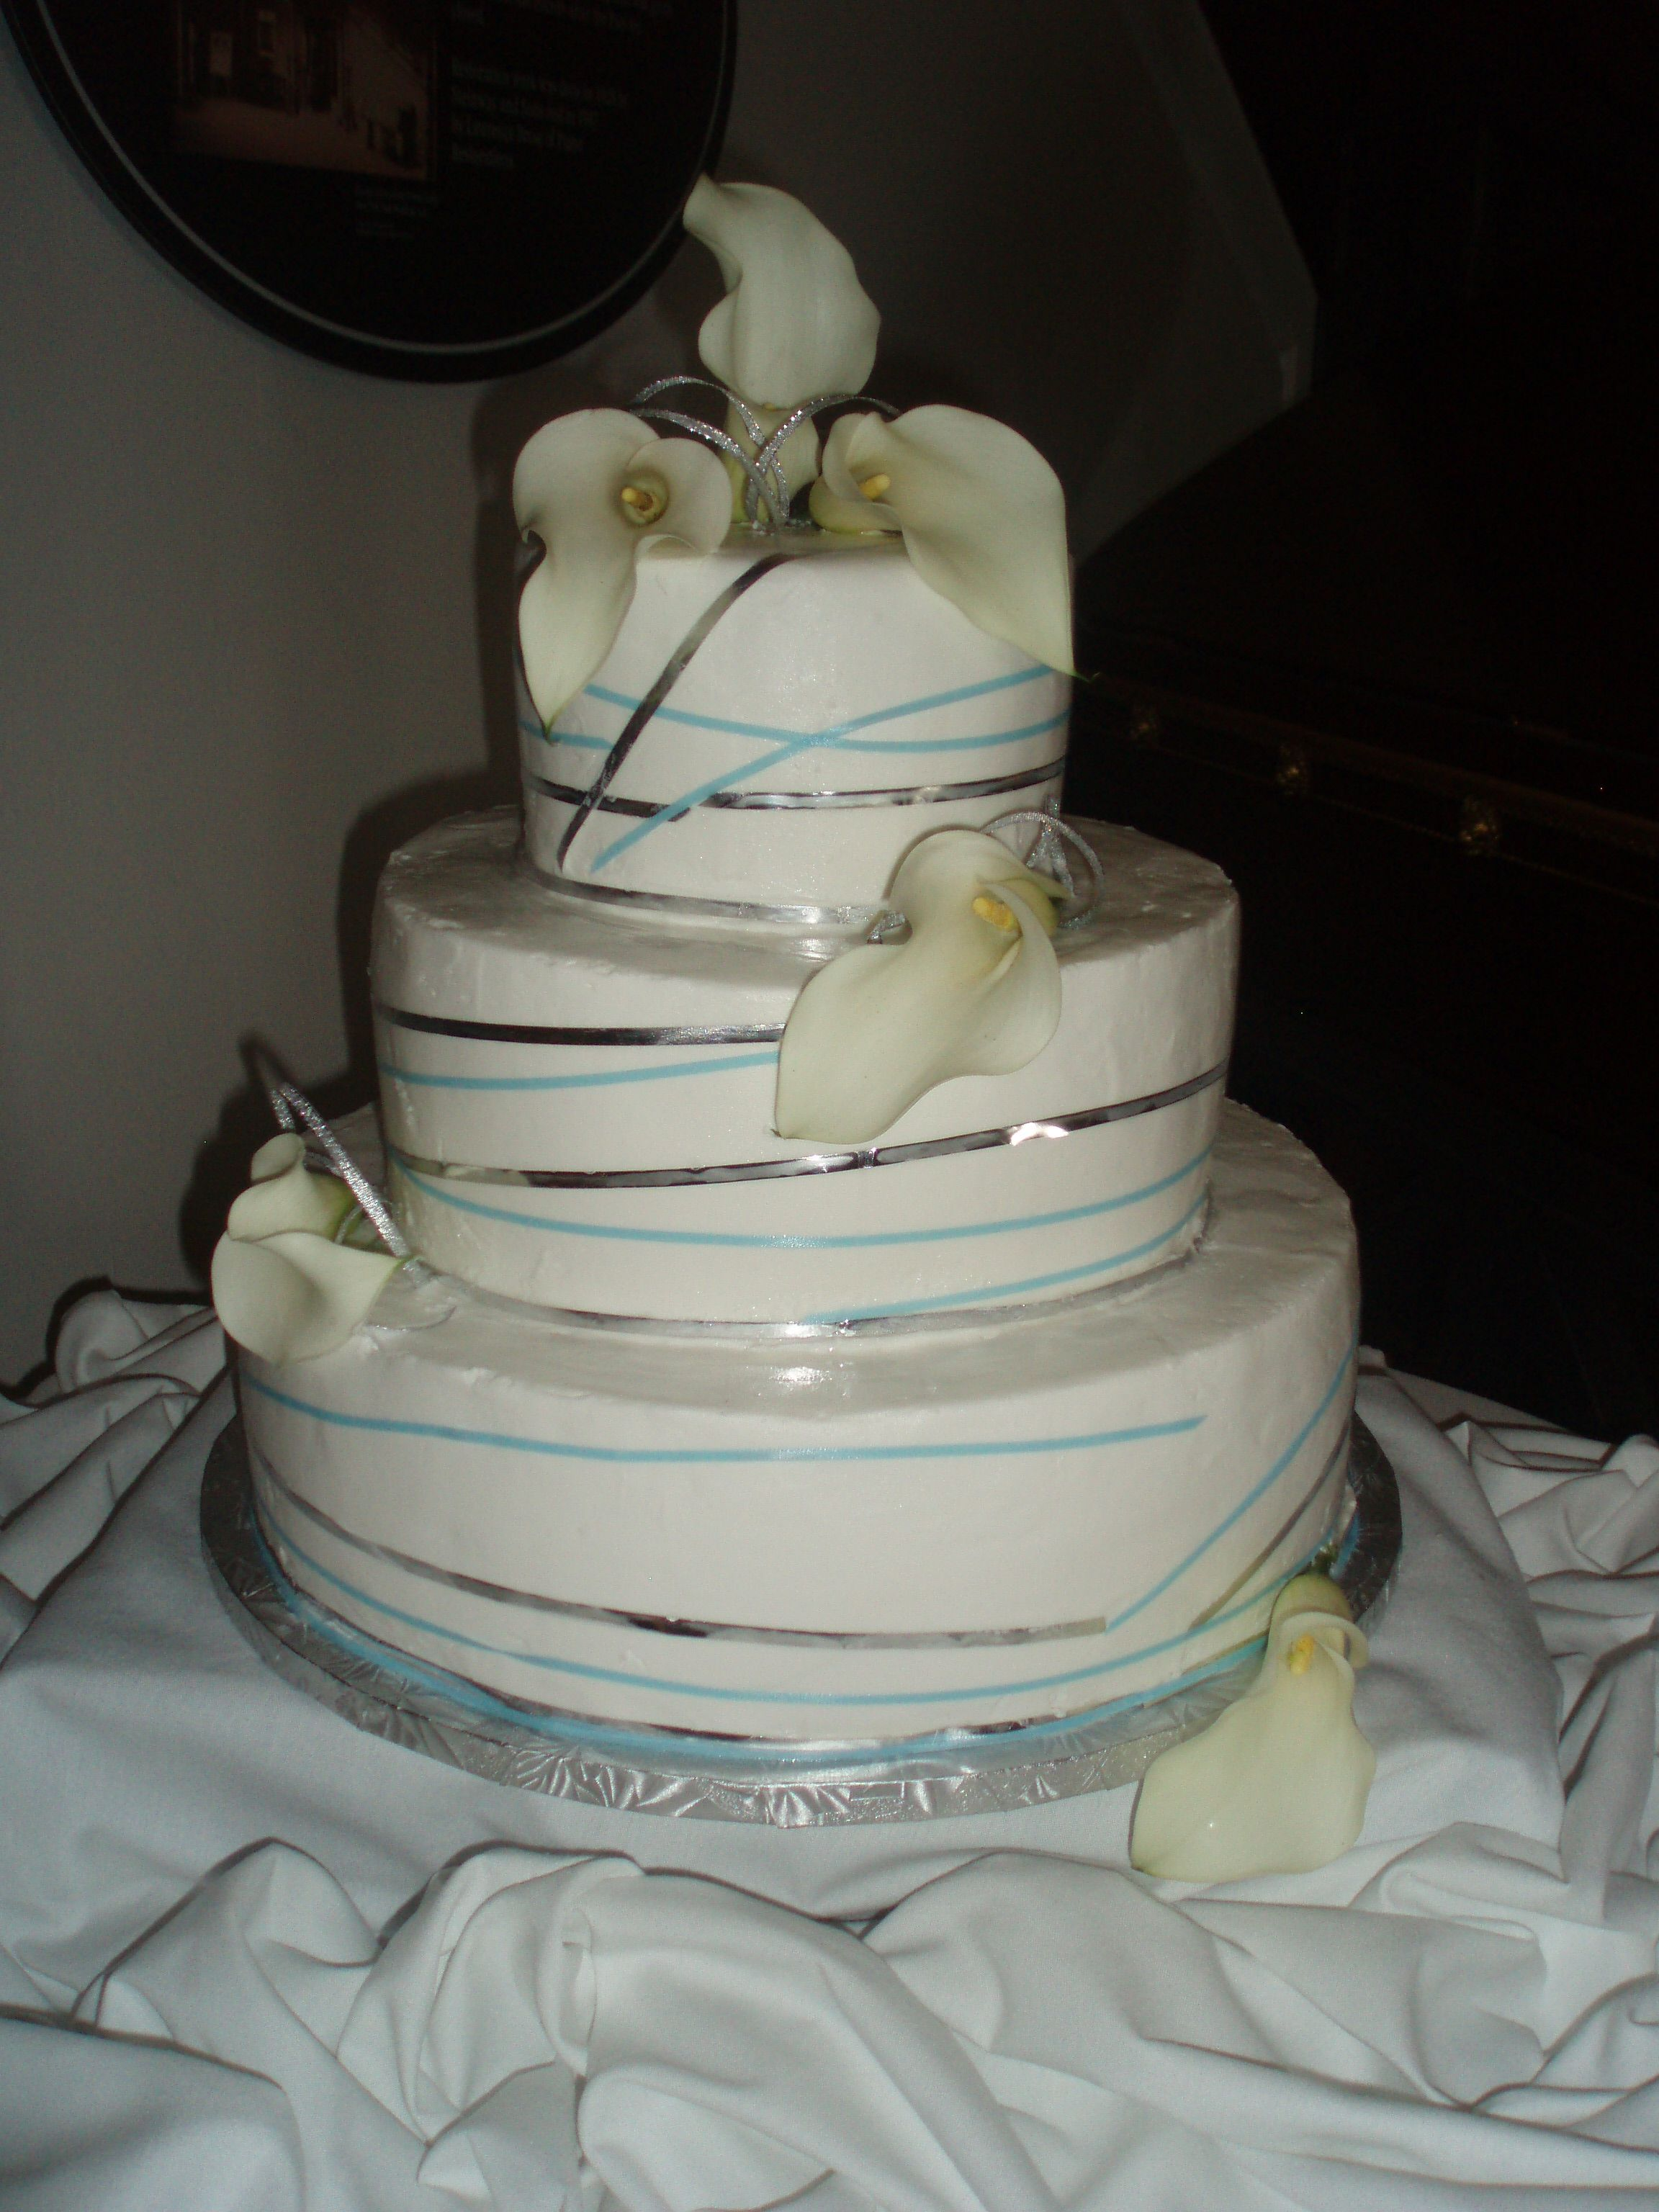 We Do Wedding Cakes Call Caramici S Bakery For A Consultation Today 1501 Hertel Ave Buffalo Ny 716 874 2253 Www Caramicisbakery Weddingcake